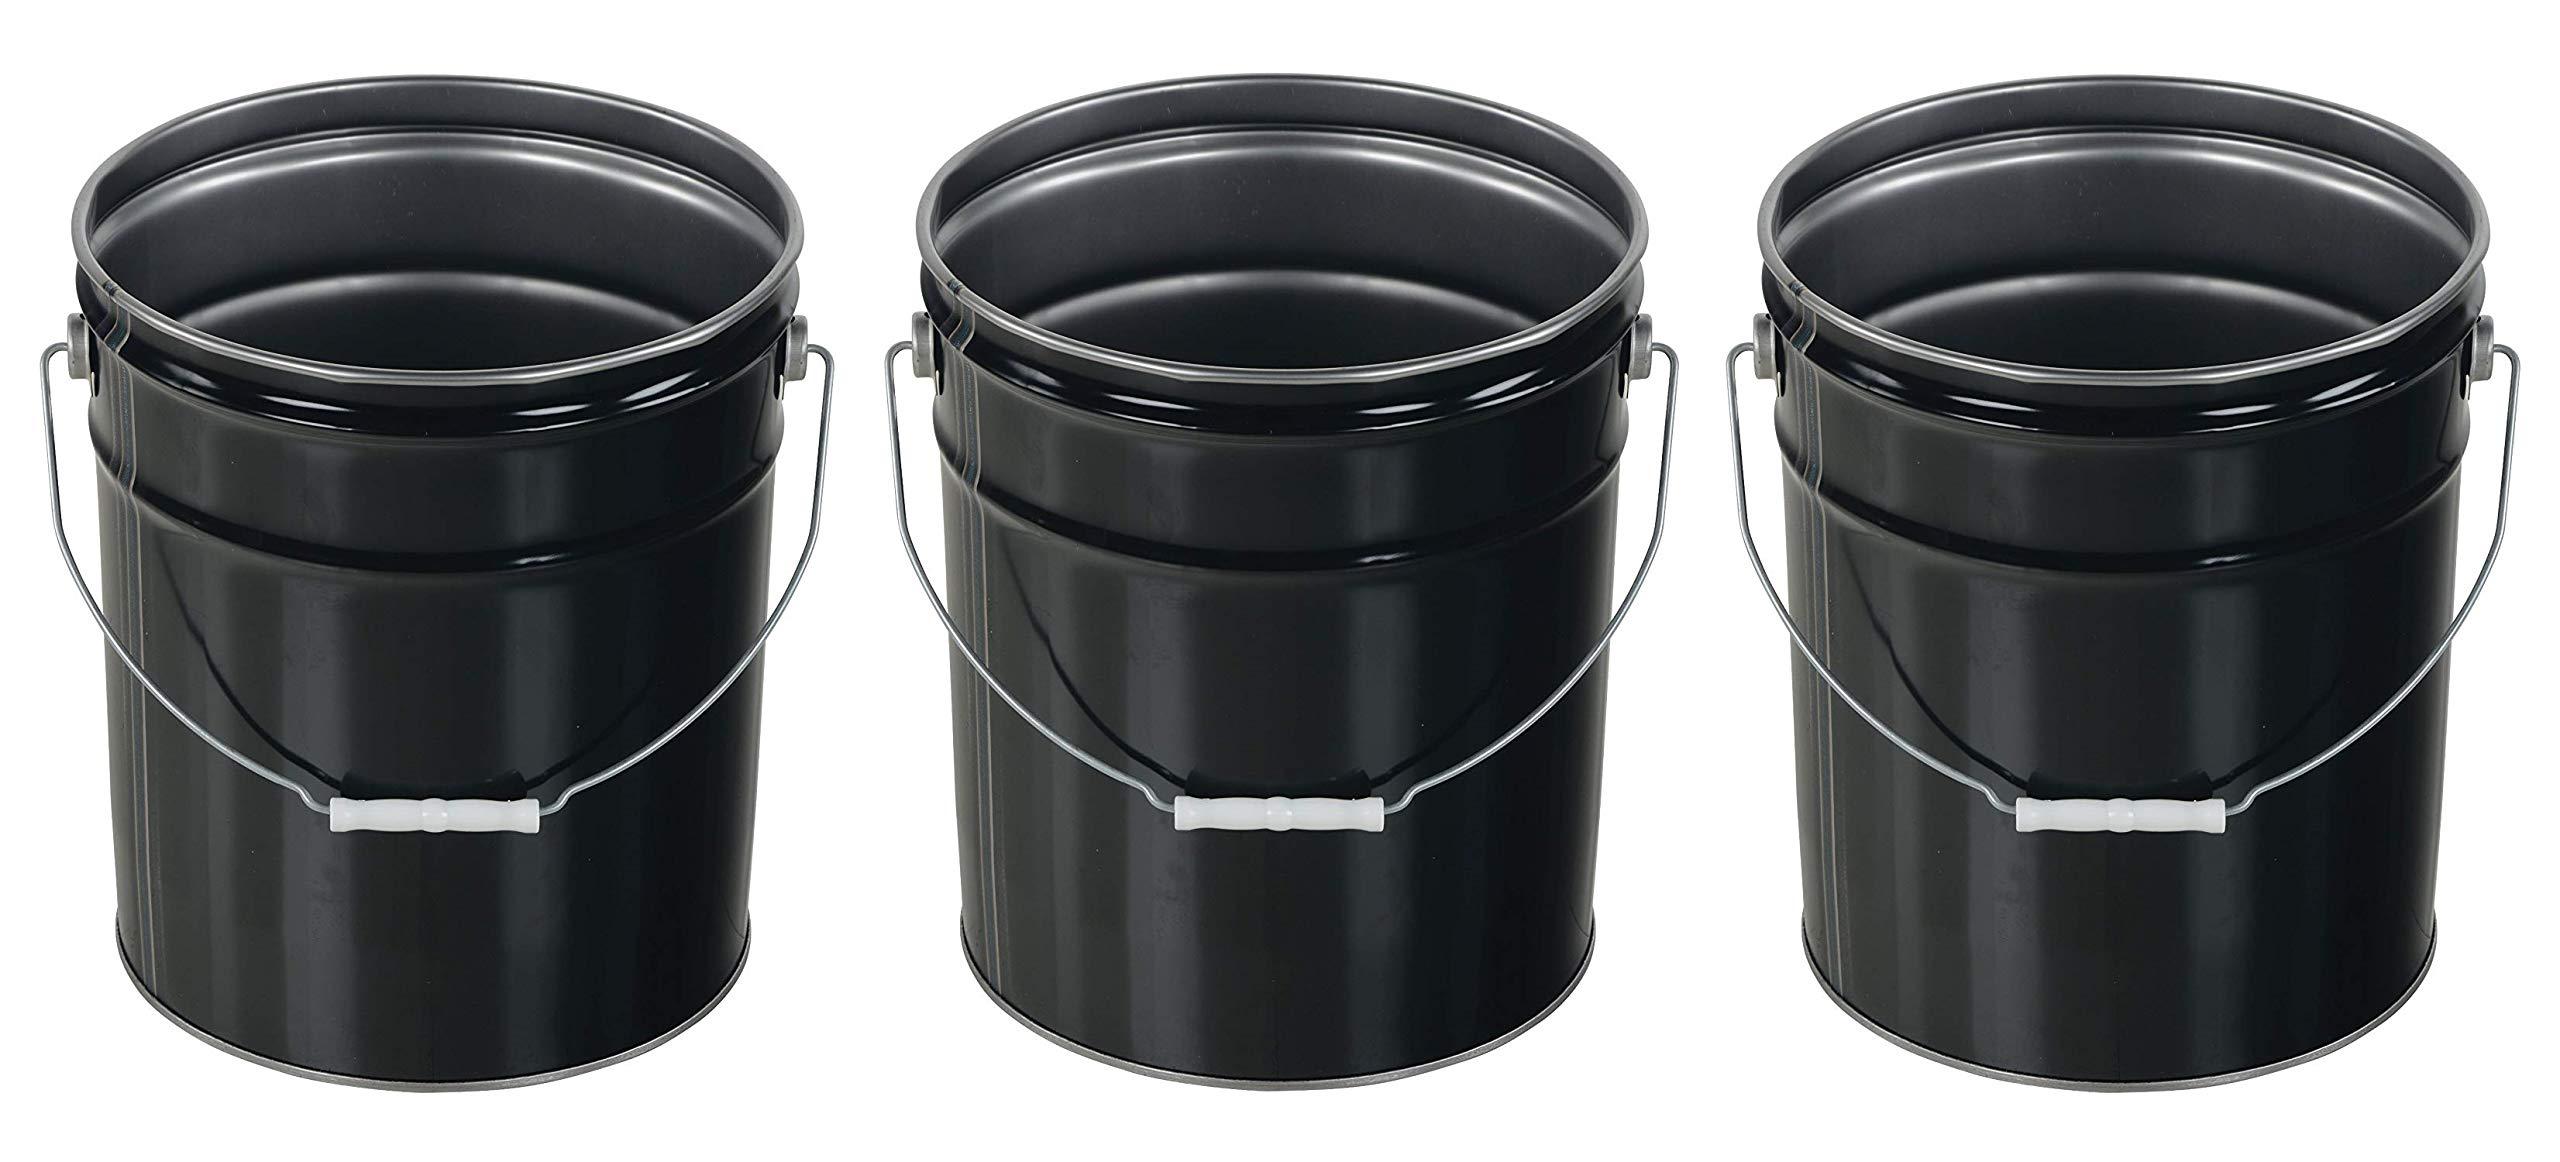 Vestil Pail-STL-RI Steel Open Head Pail with Handle, 5 Gallon Capacity, Black (Pack of 3) by Vestil (Image #1)